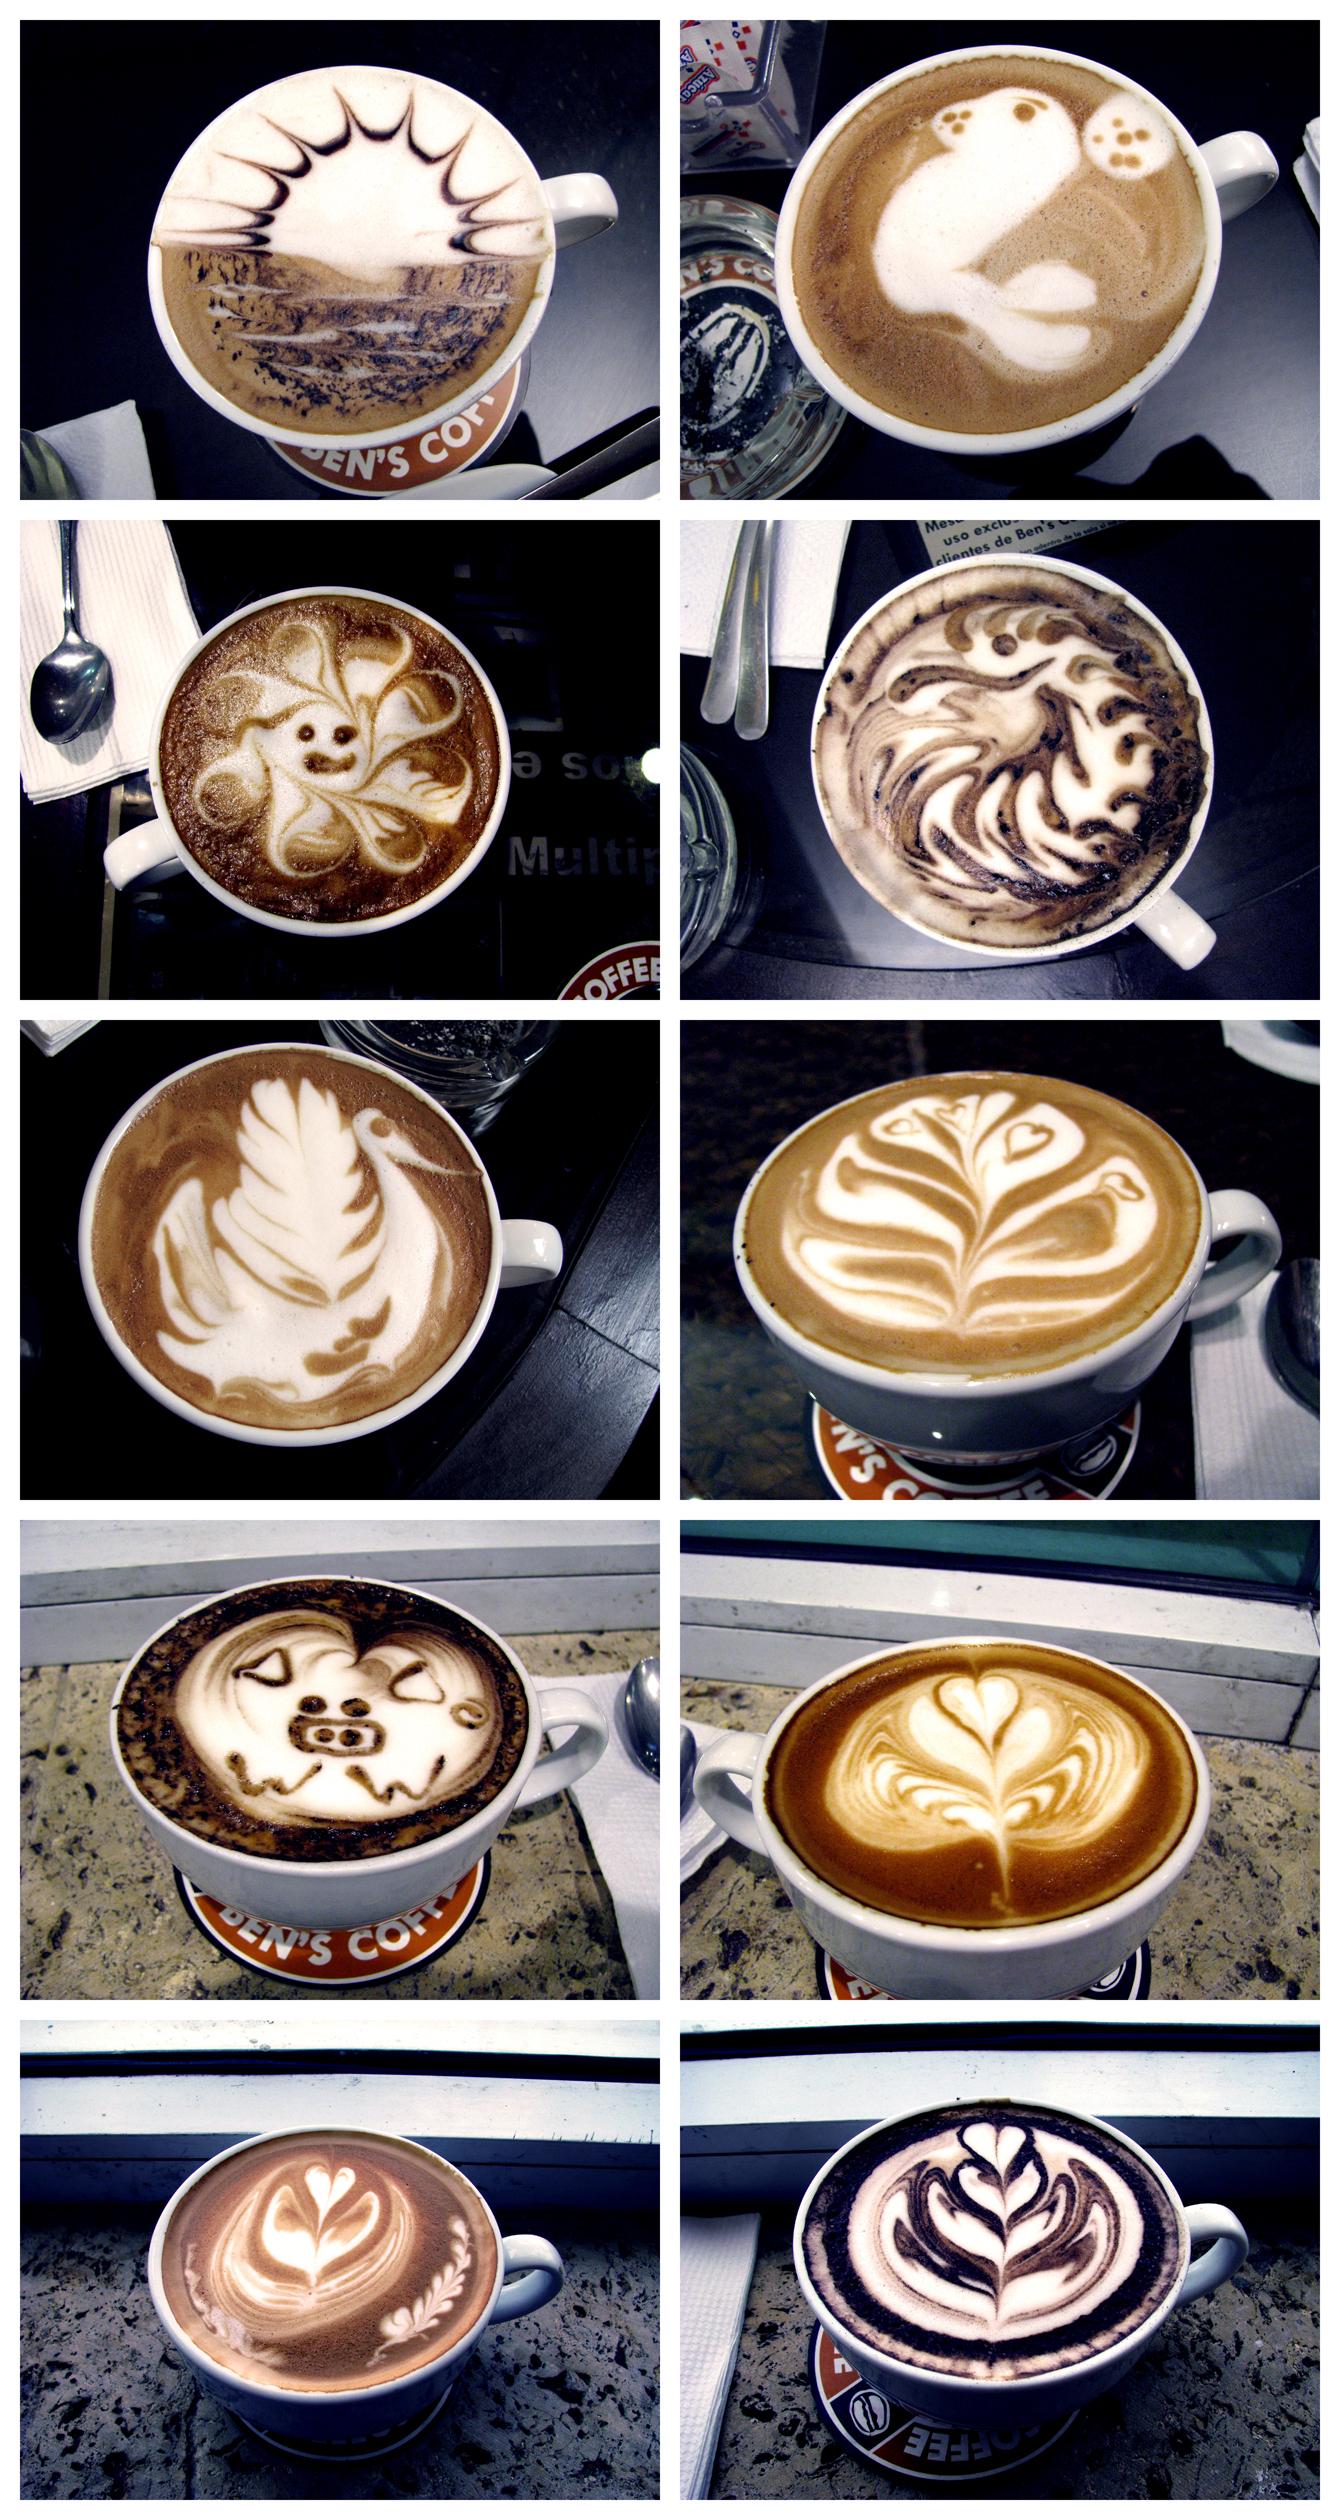 Ben's Coffee v2.0 by vicexversa